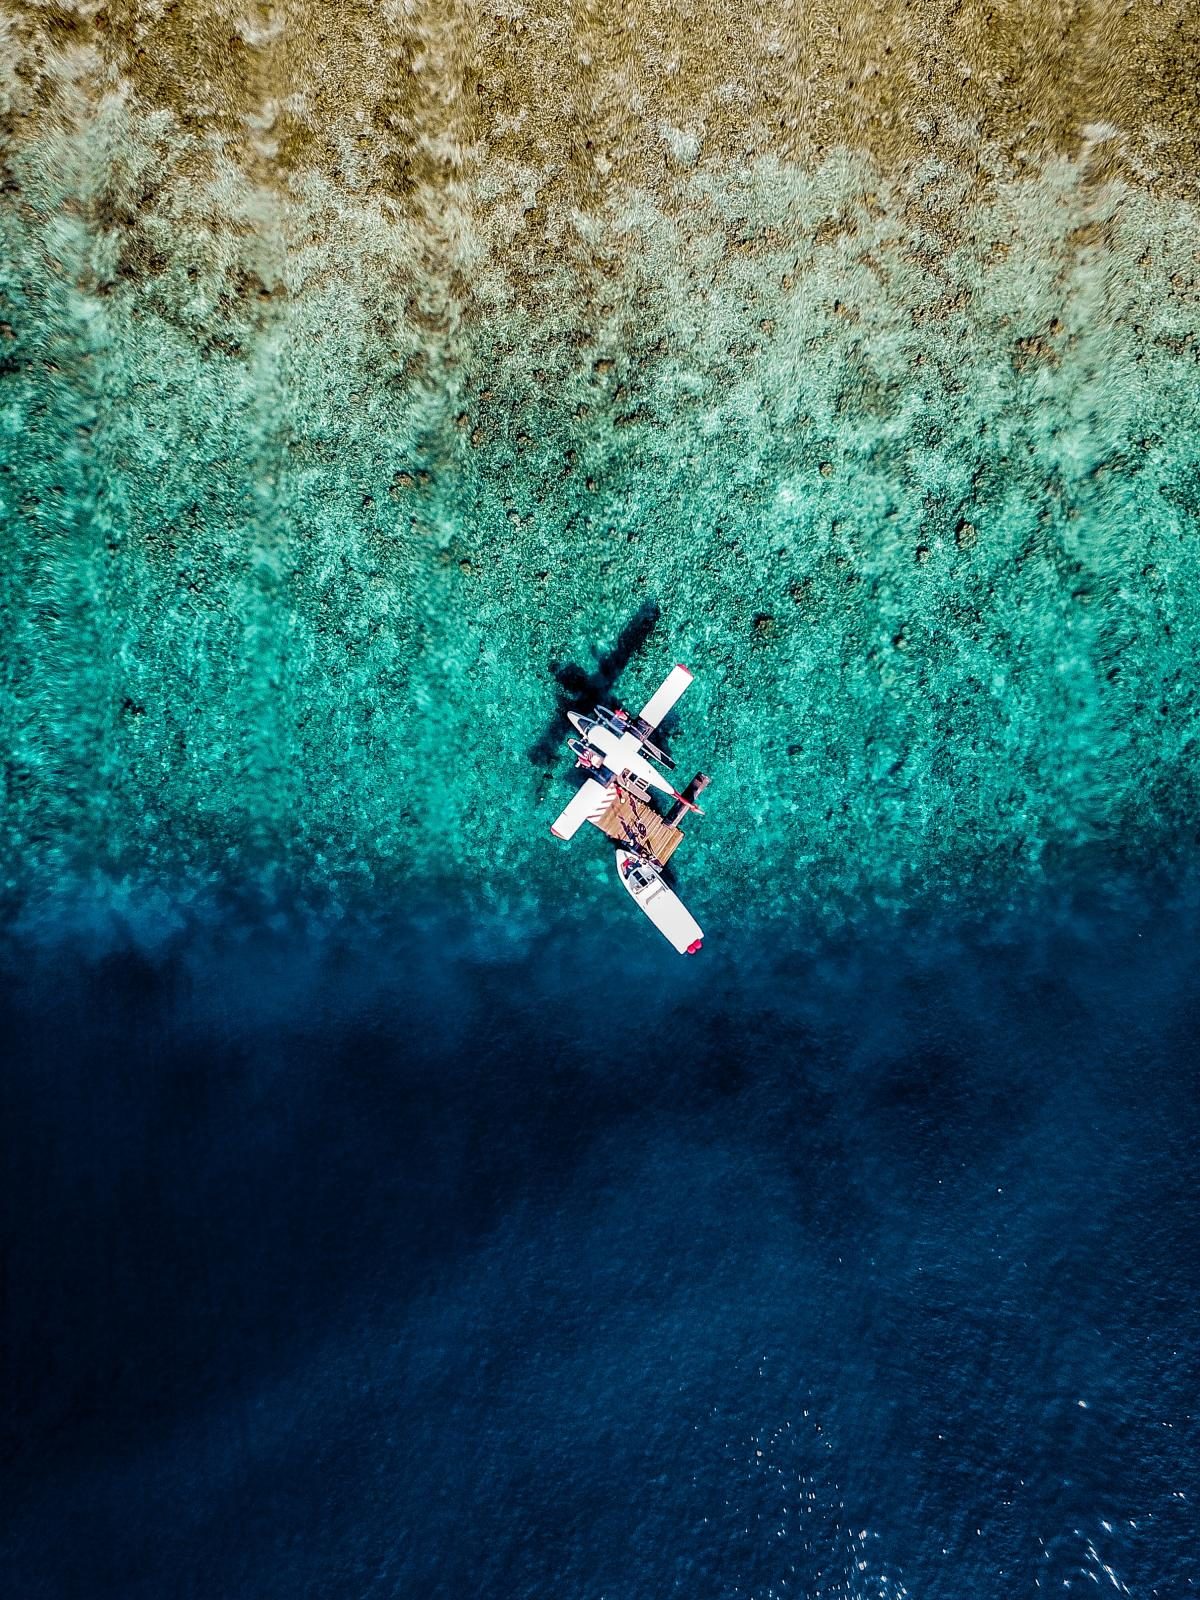 Device Snorkel Sky #425440